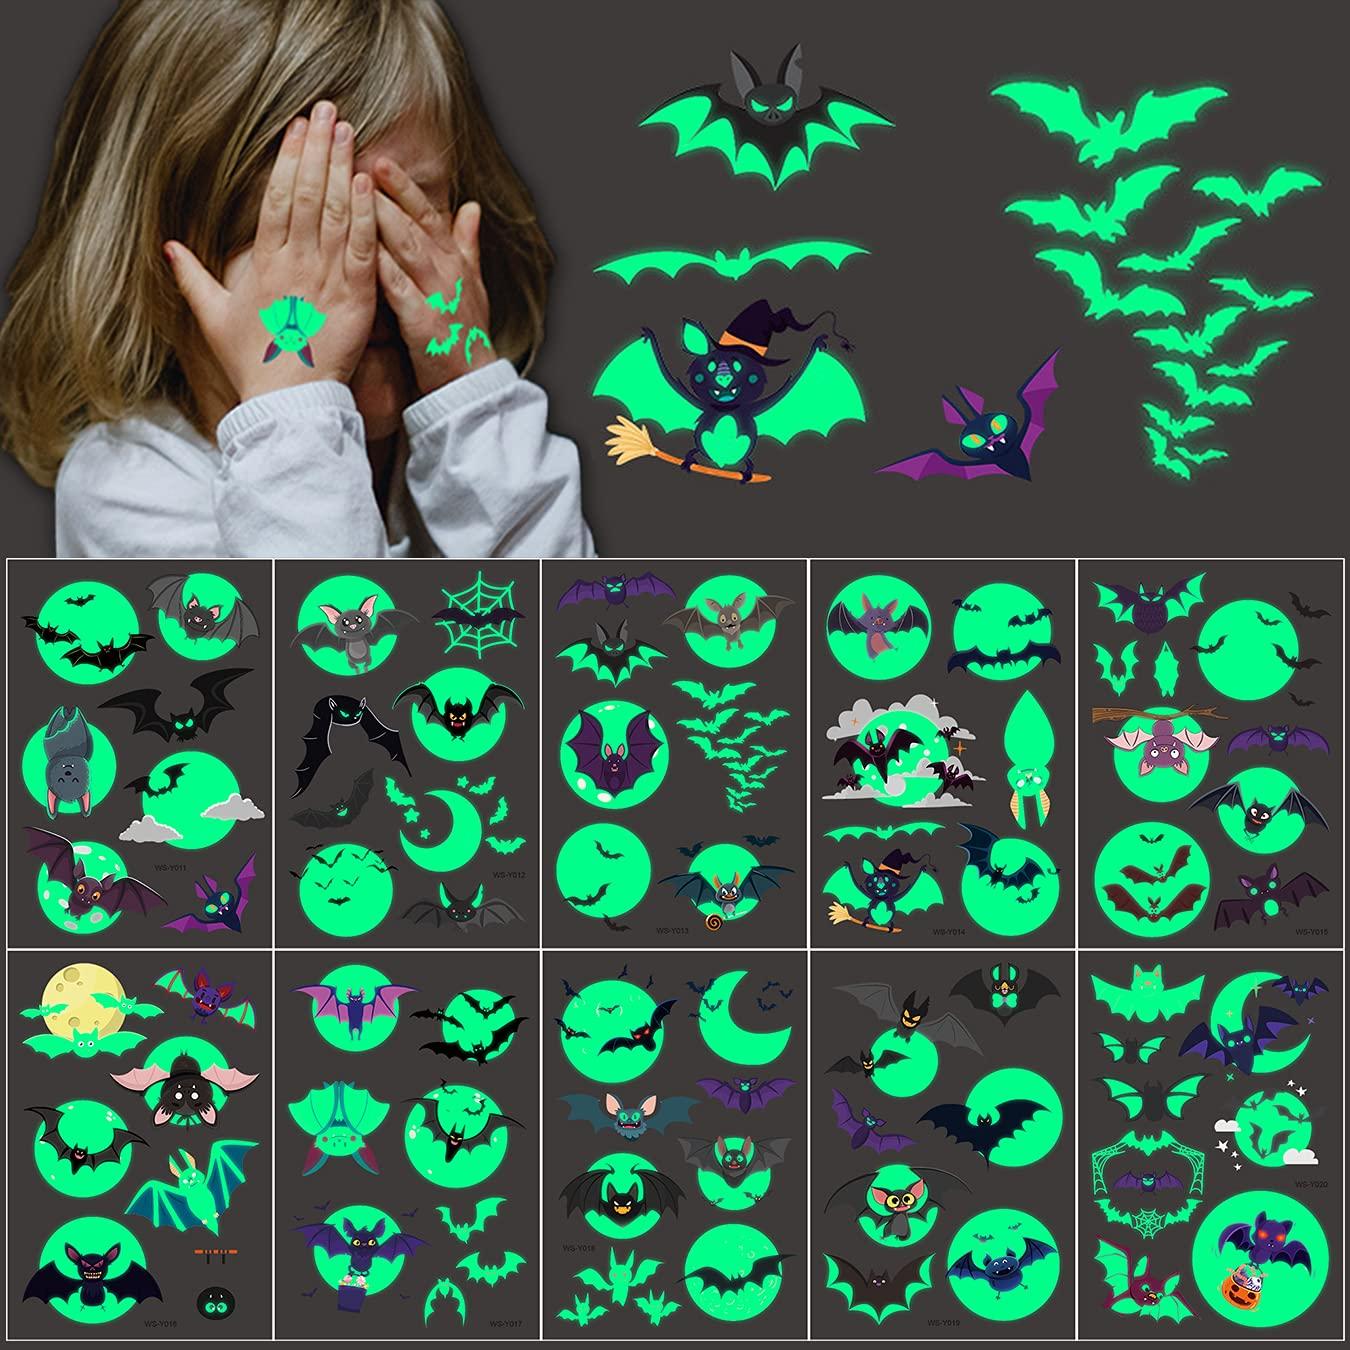 Department store 10 Sheets Halloween Glow in the Dark Tattoos Bat Temporary Kids Long Beach Mall